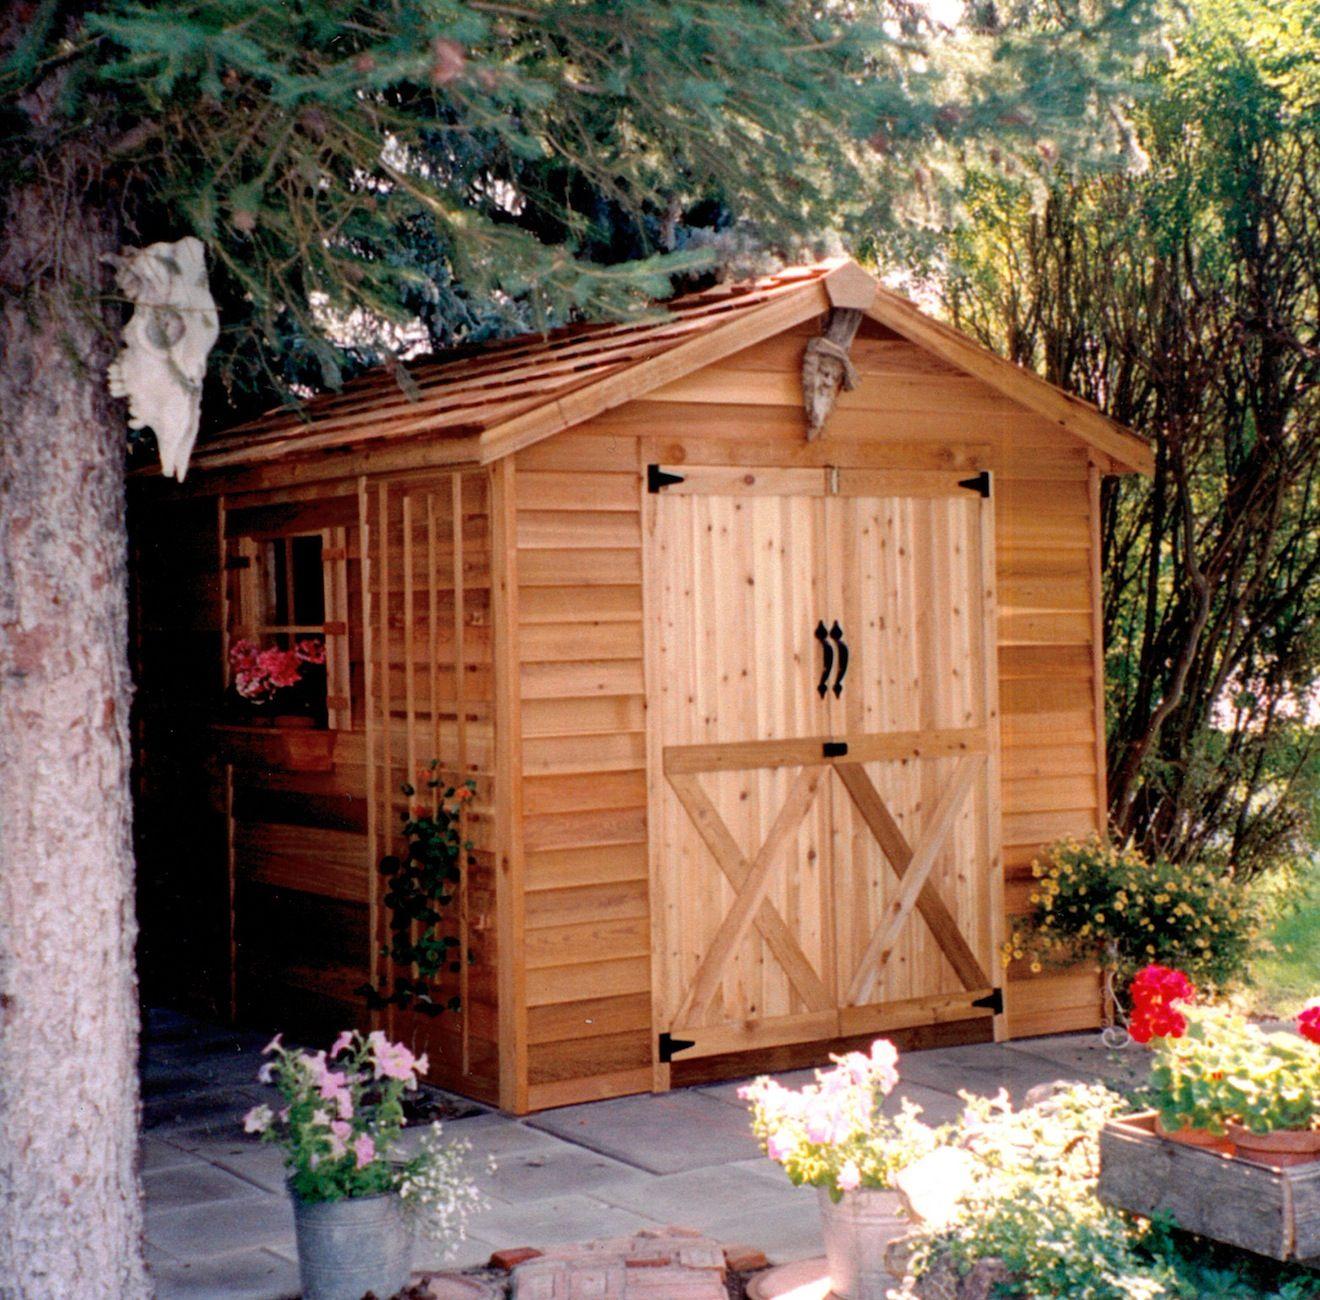 Ranchers Large Shed Kits Cedar Shed Shed Kits Garden Shed Kits